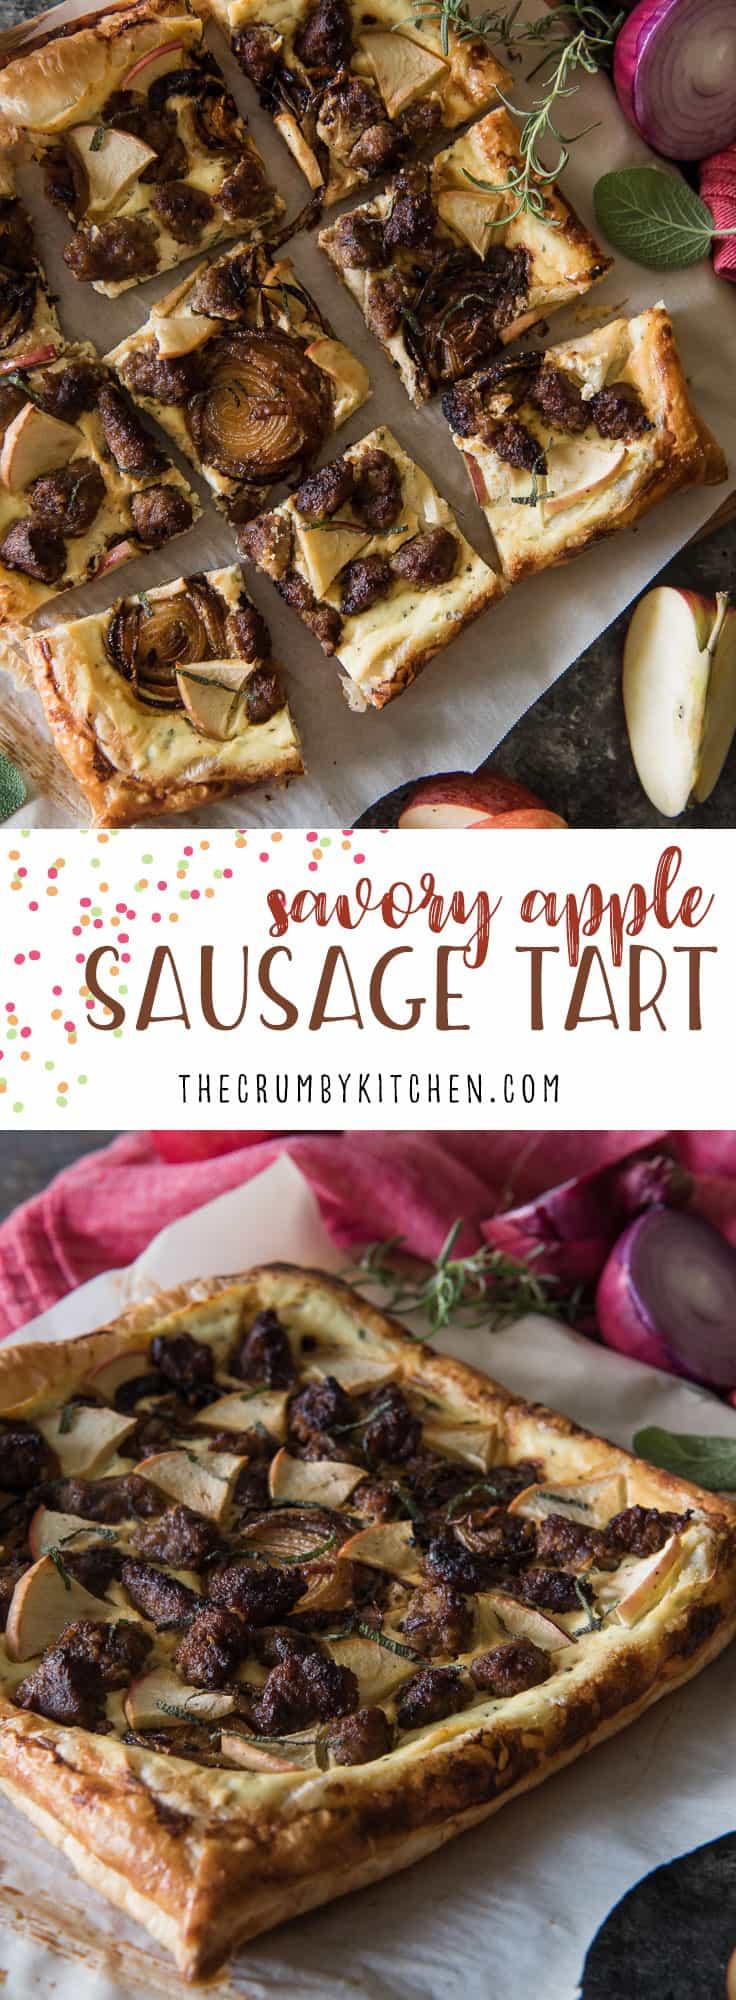 Savory Apple Sausage Tart Appleweek The Crumby Kitchen